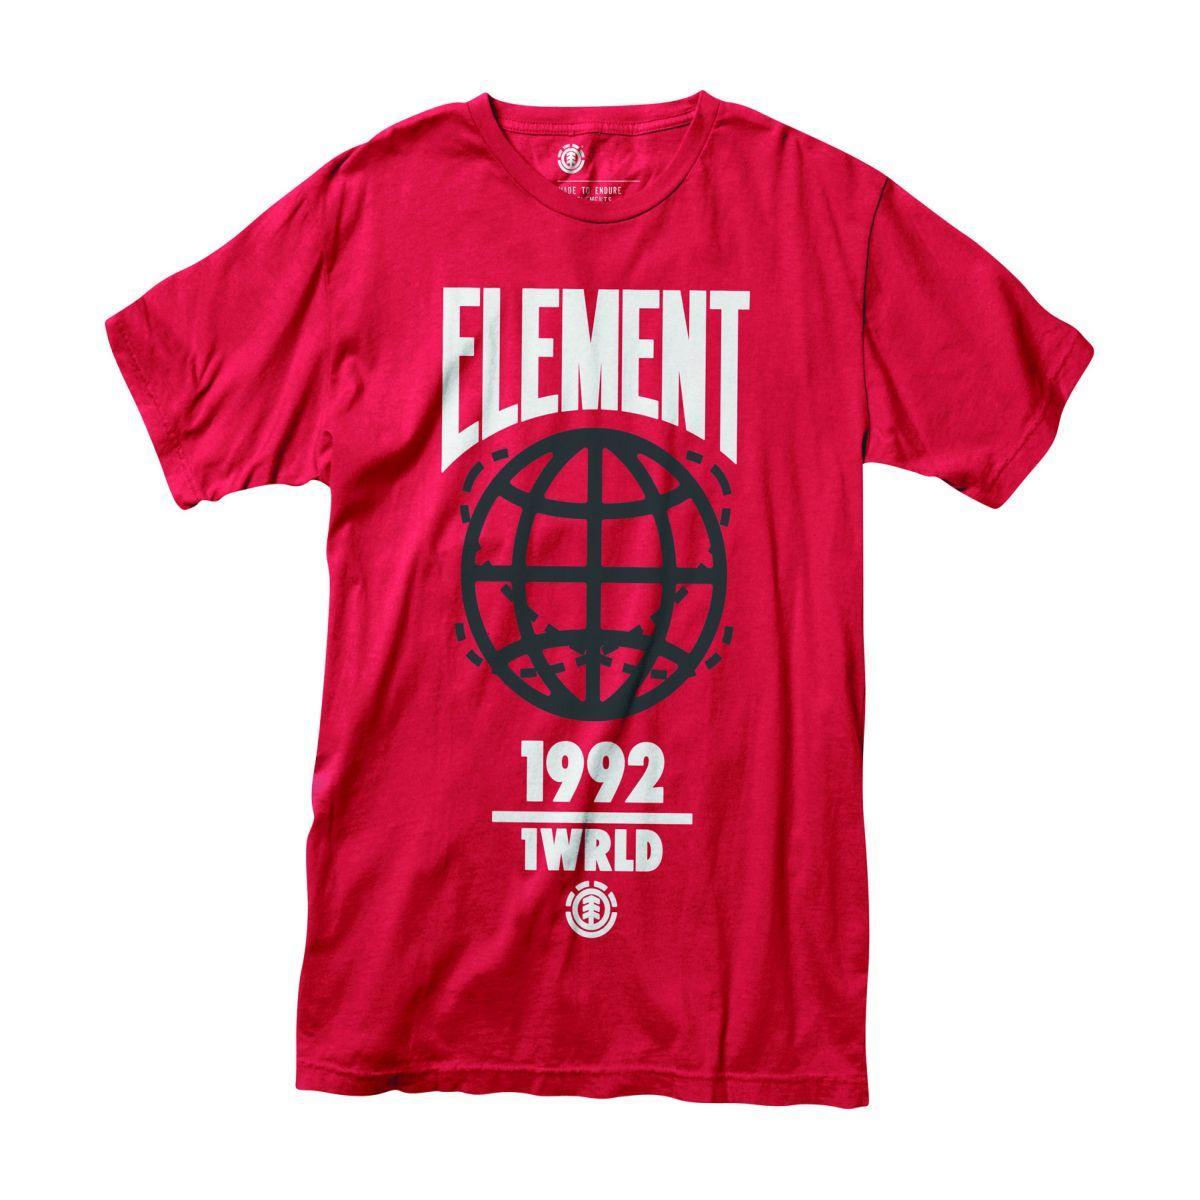 Element - Endure the Elements - image 2 - student project